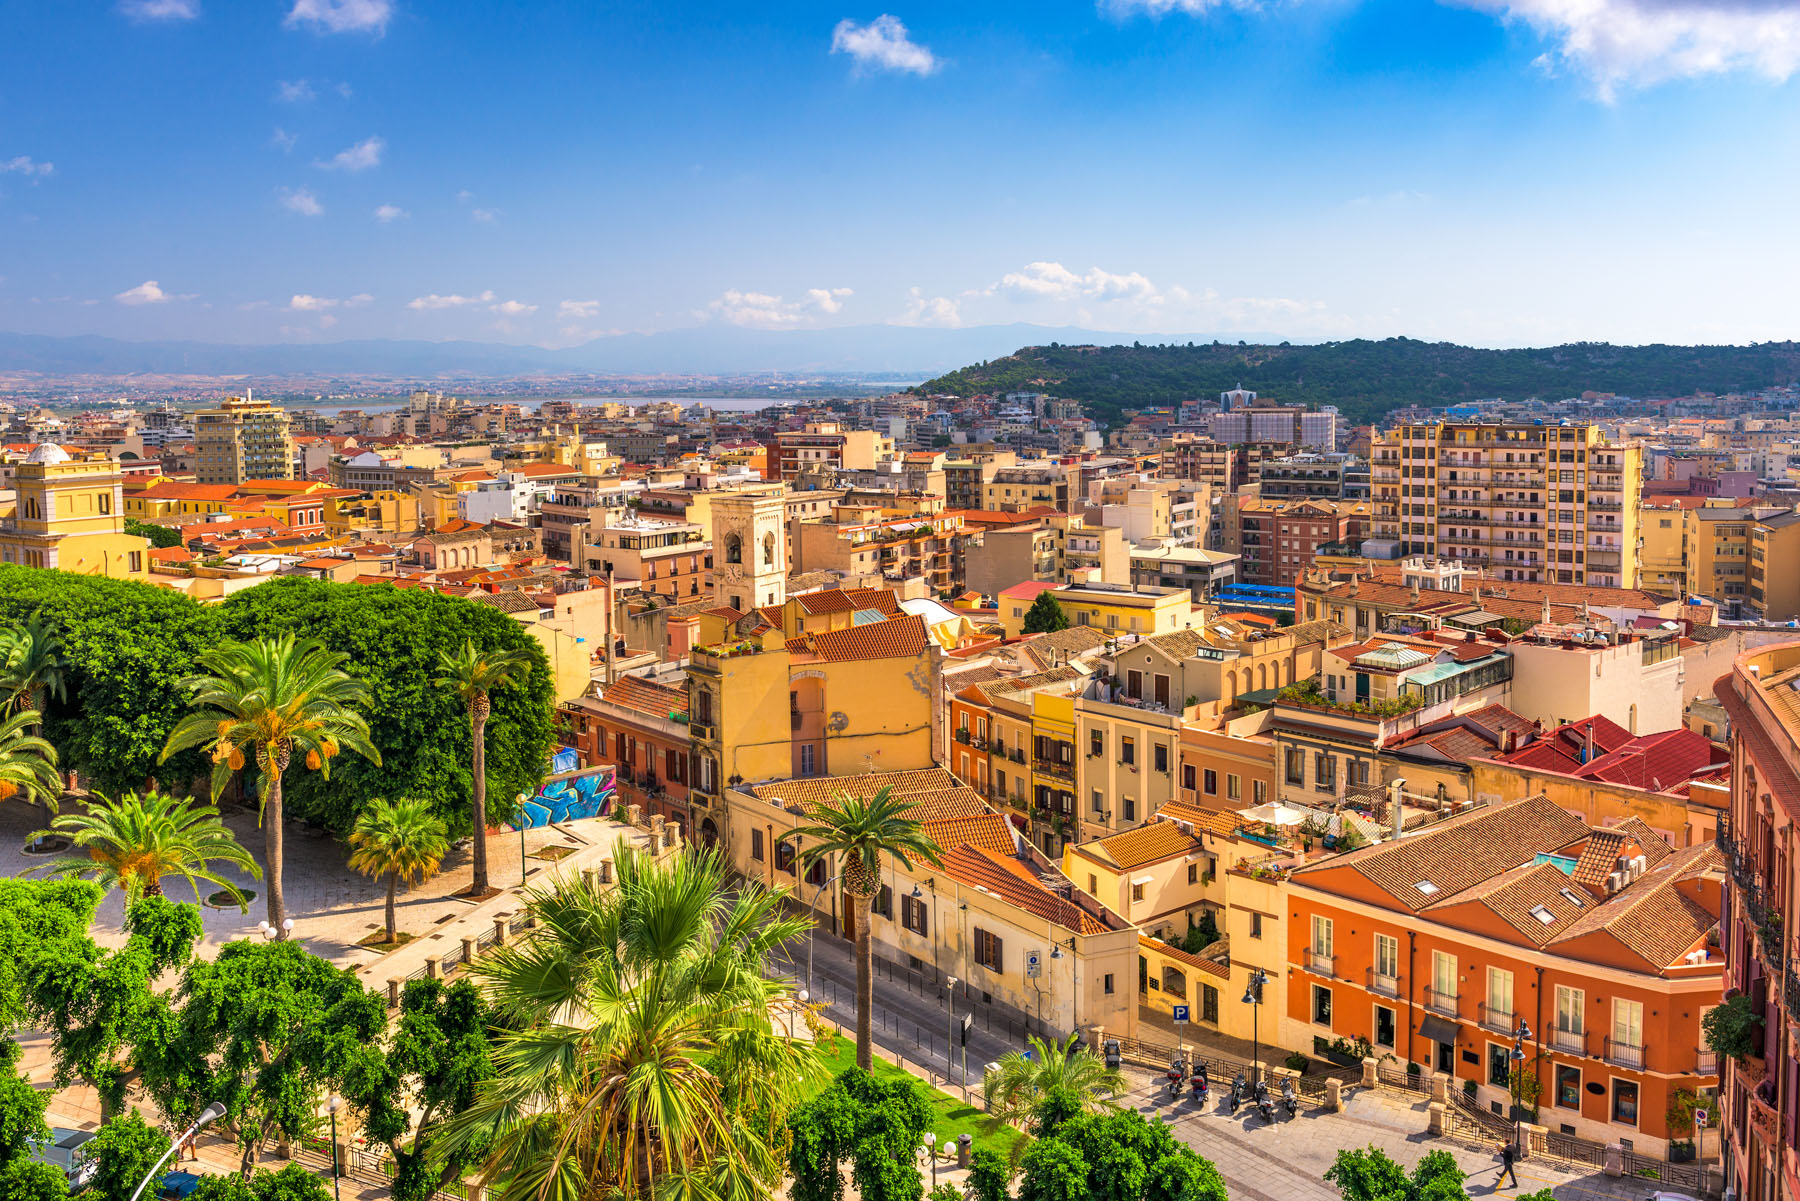 Sardinia-Cagliari_368531603